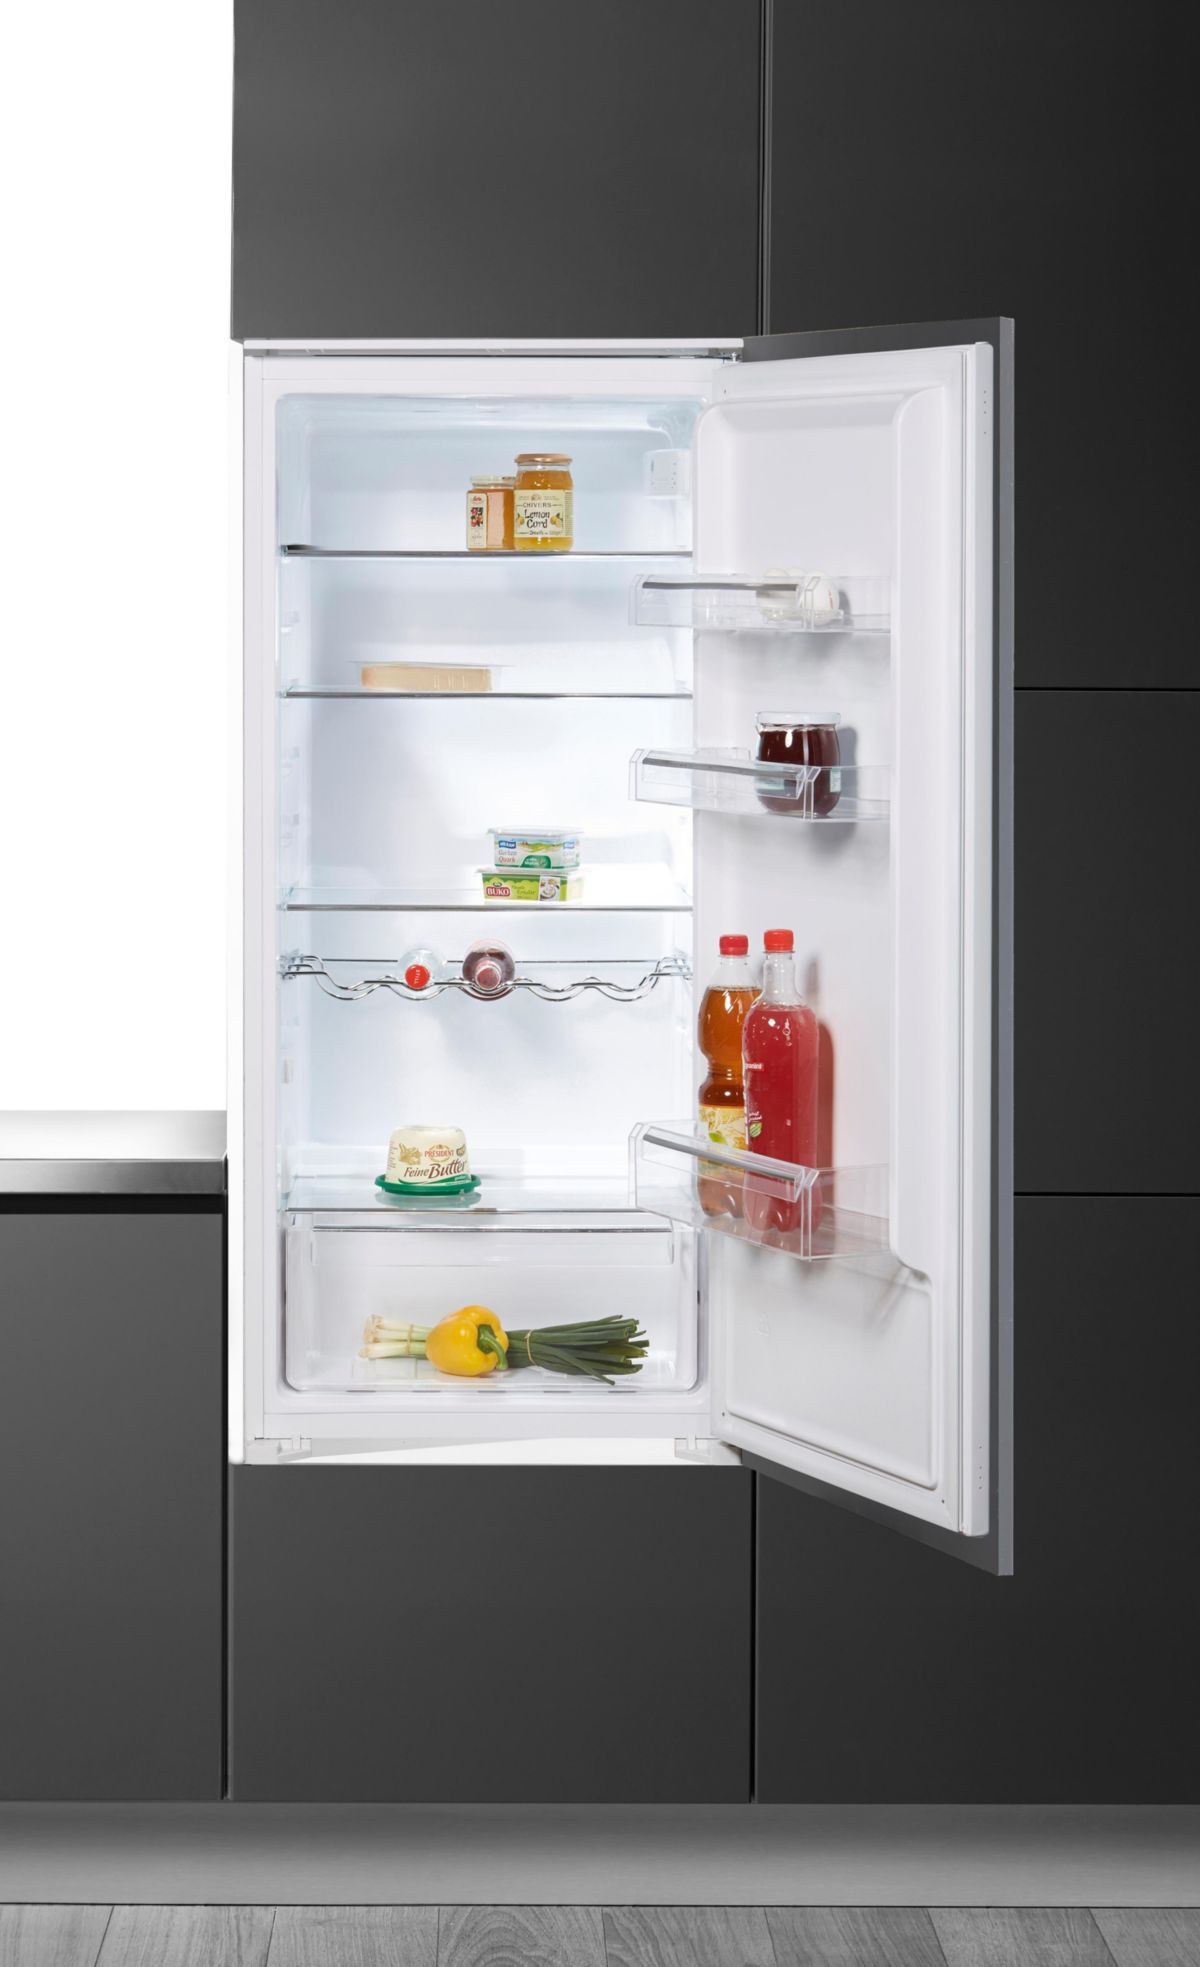 Hanseatic Einbau-Kühlschrank HEKS12254A2, Energ...